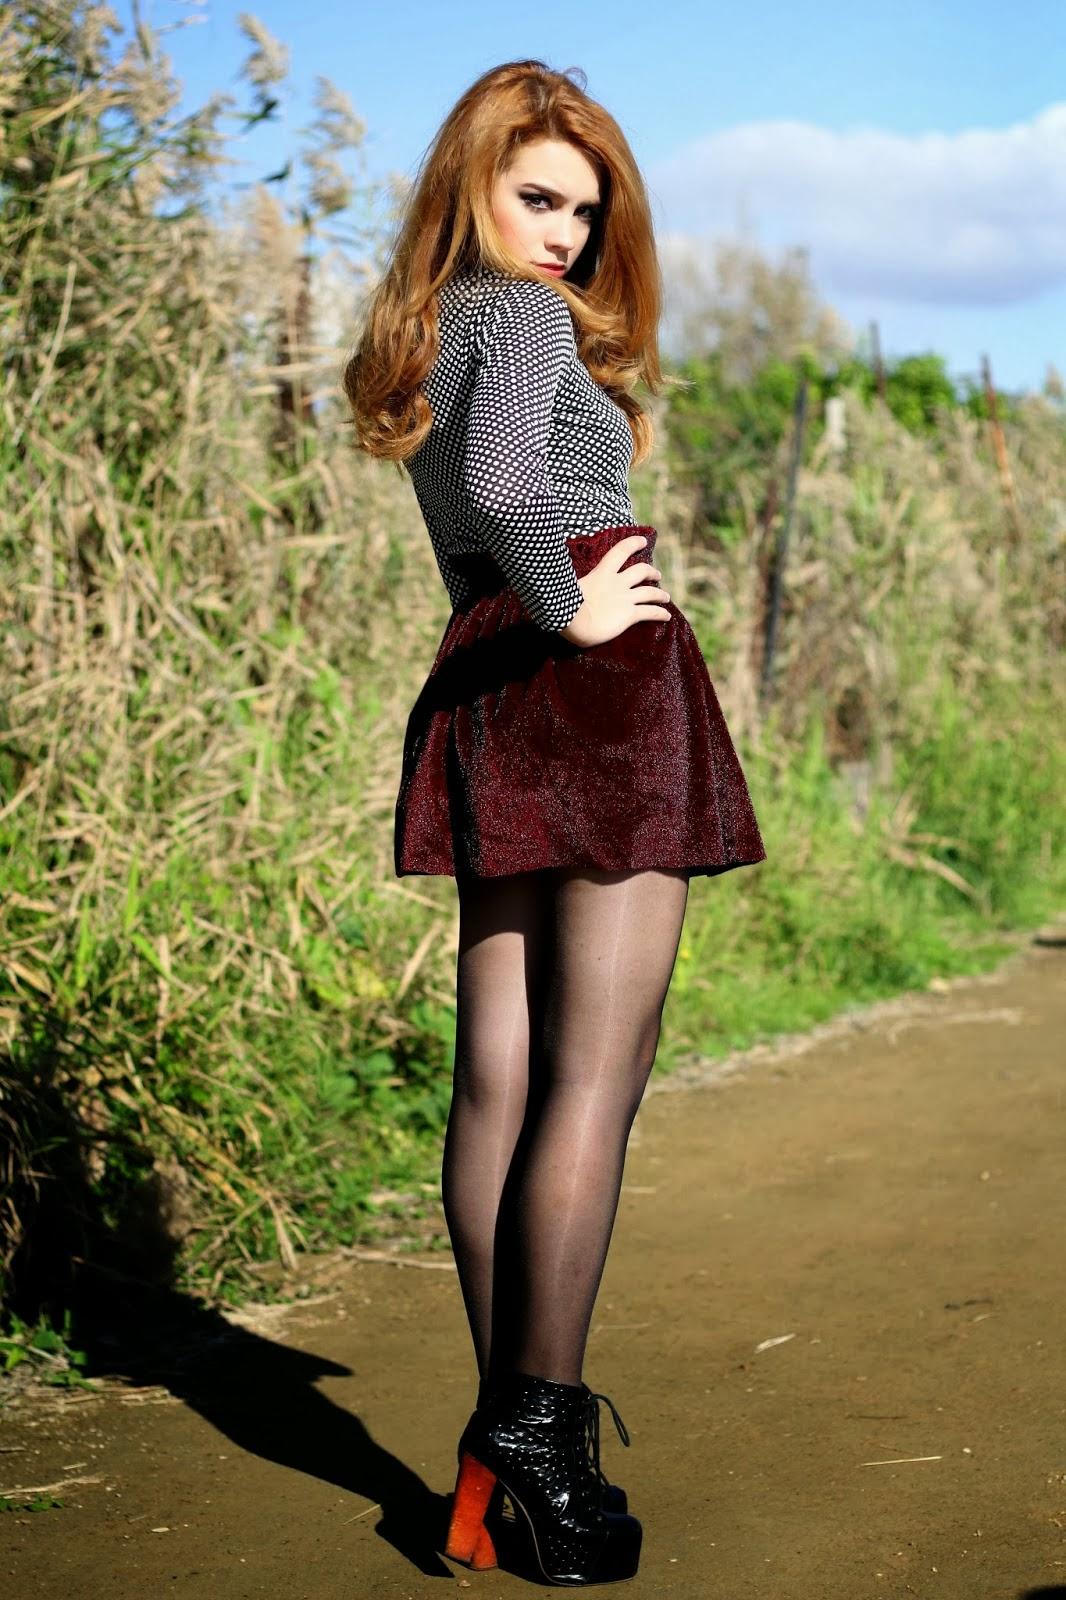 Pantyhose Legs Skirt 121